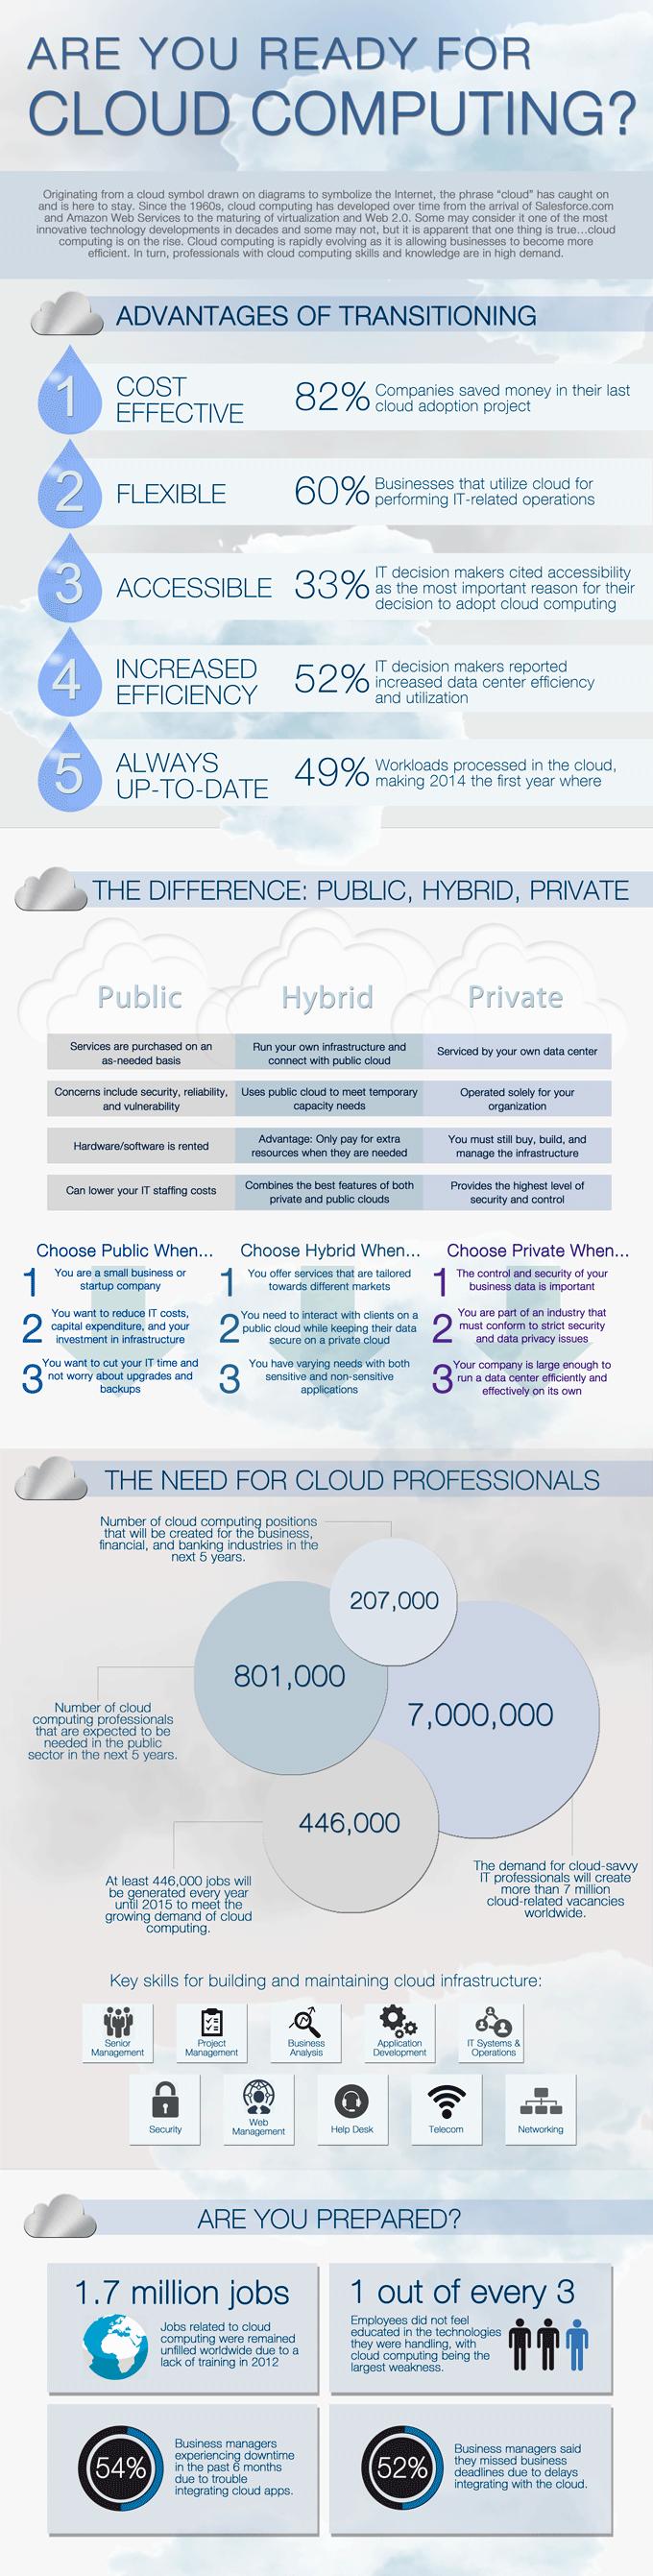 Cloud-Computing-Infographic-CloudTweaks